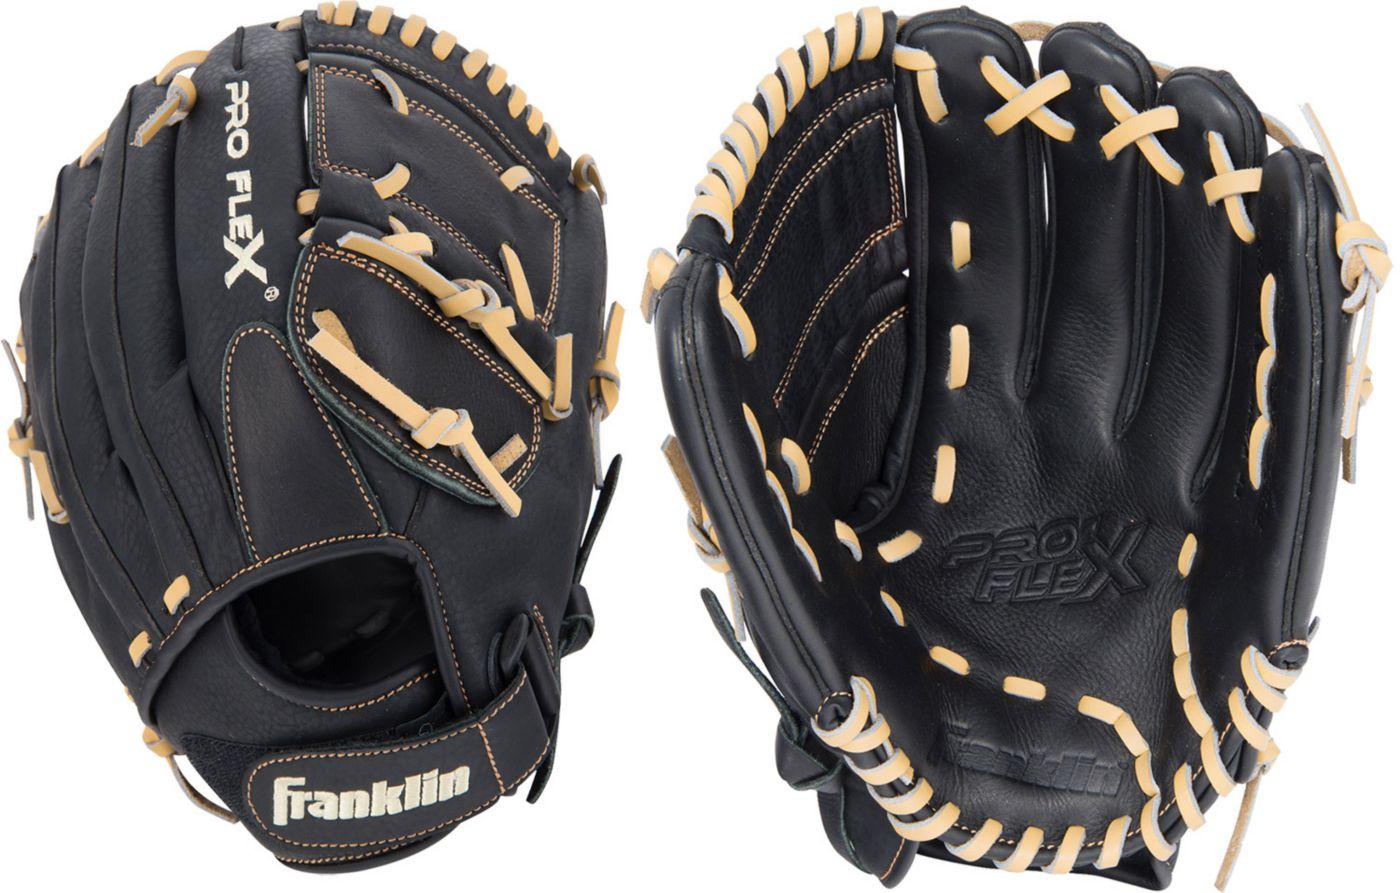 "Franklin 11.5"" Pro Flex Hybrid Series Glove"